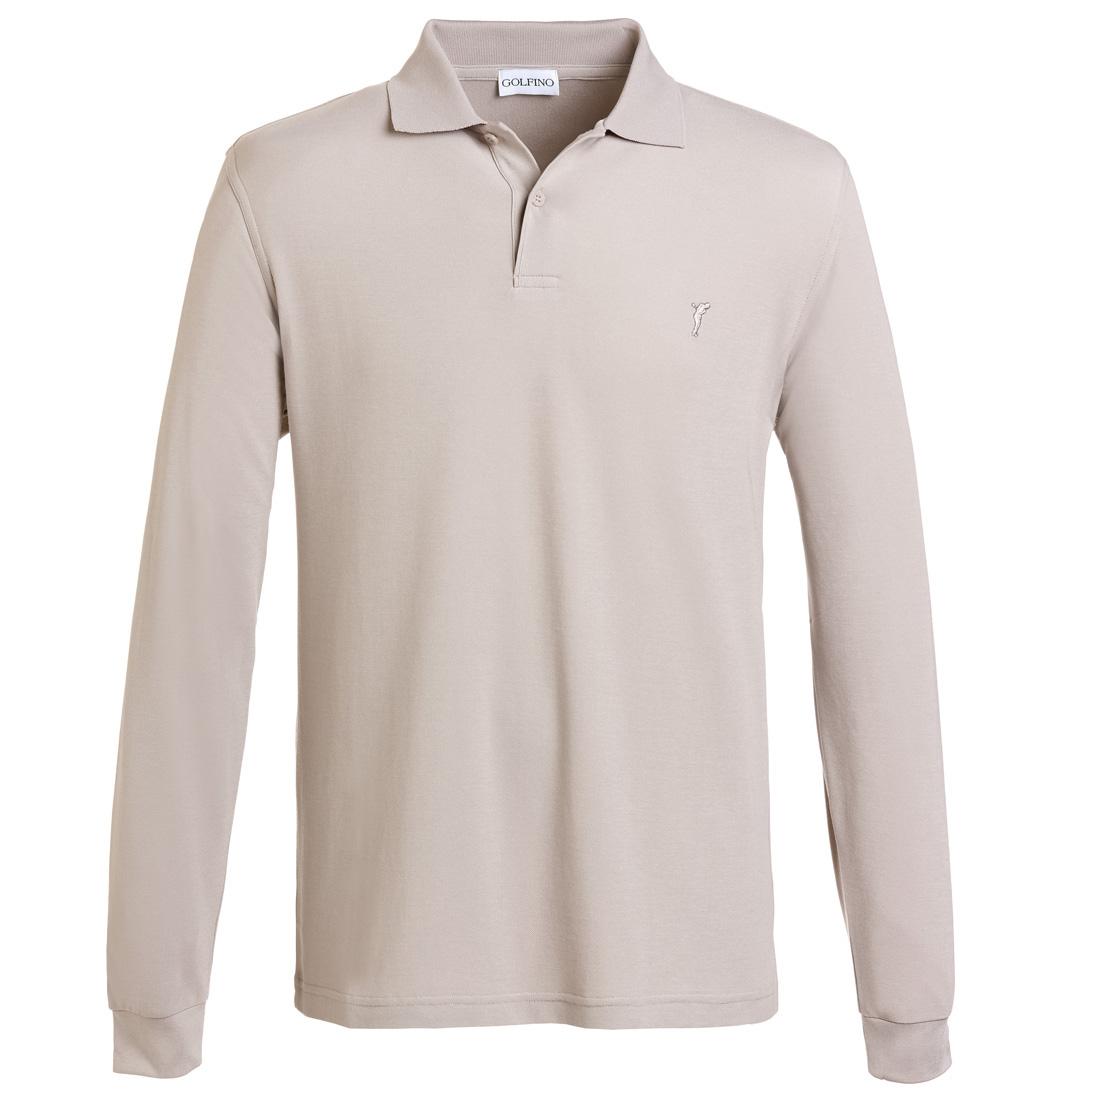 Extra Dry Herbst Poloshirt gebürstet Beige